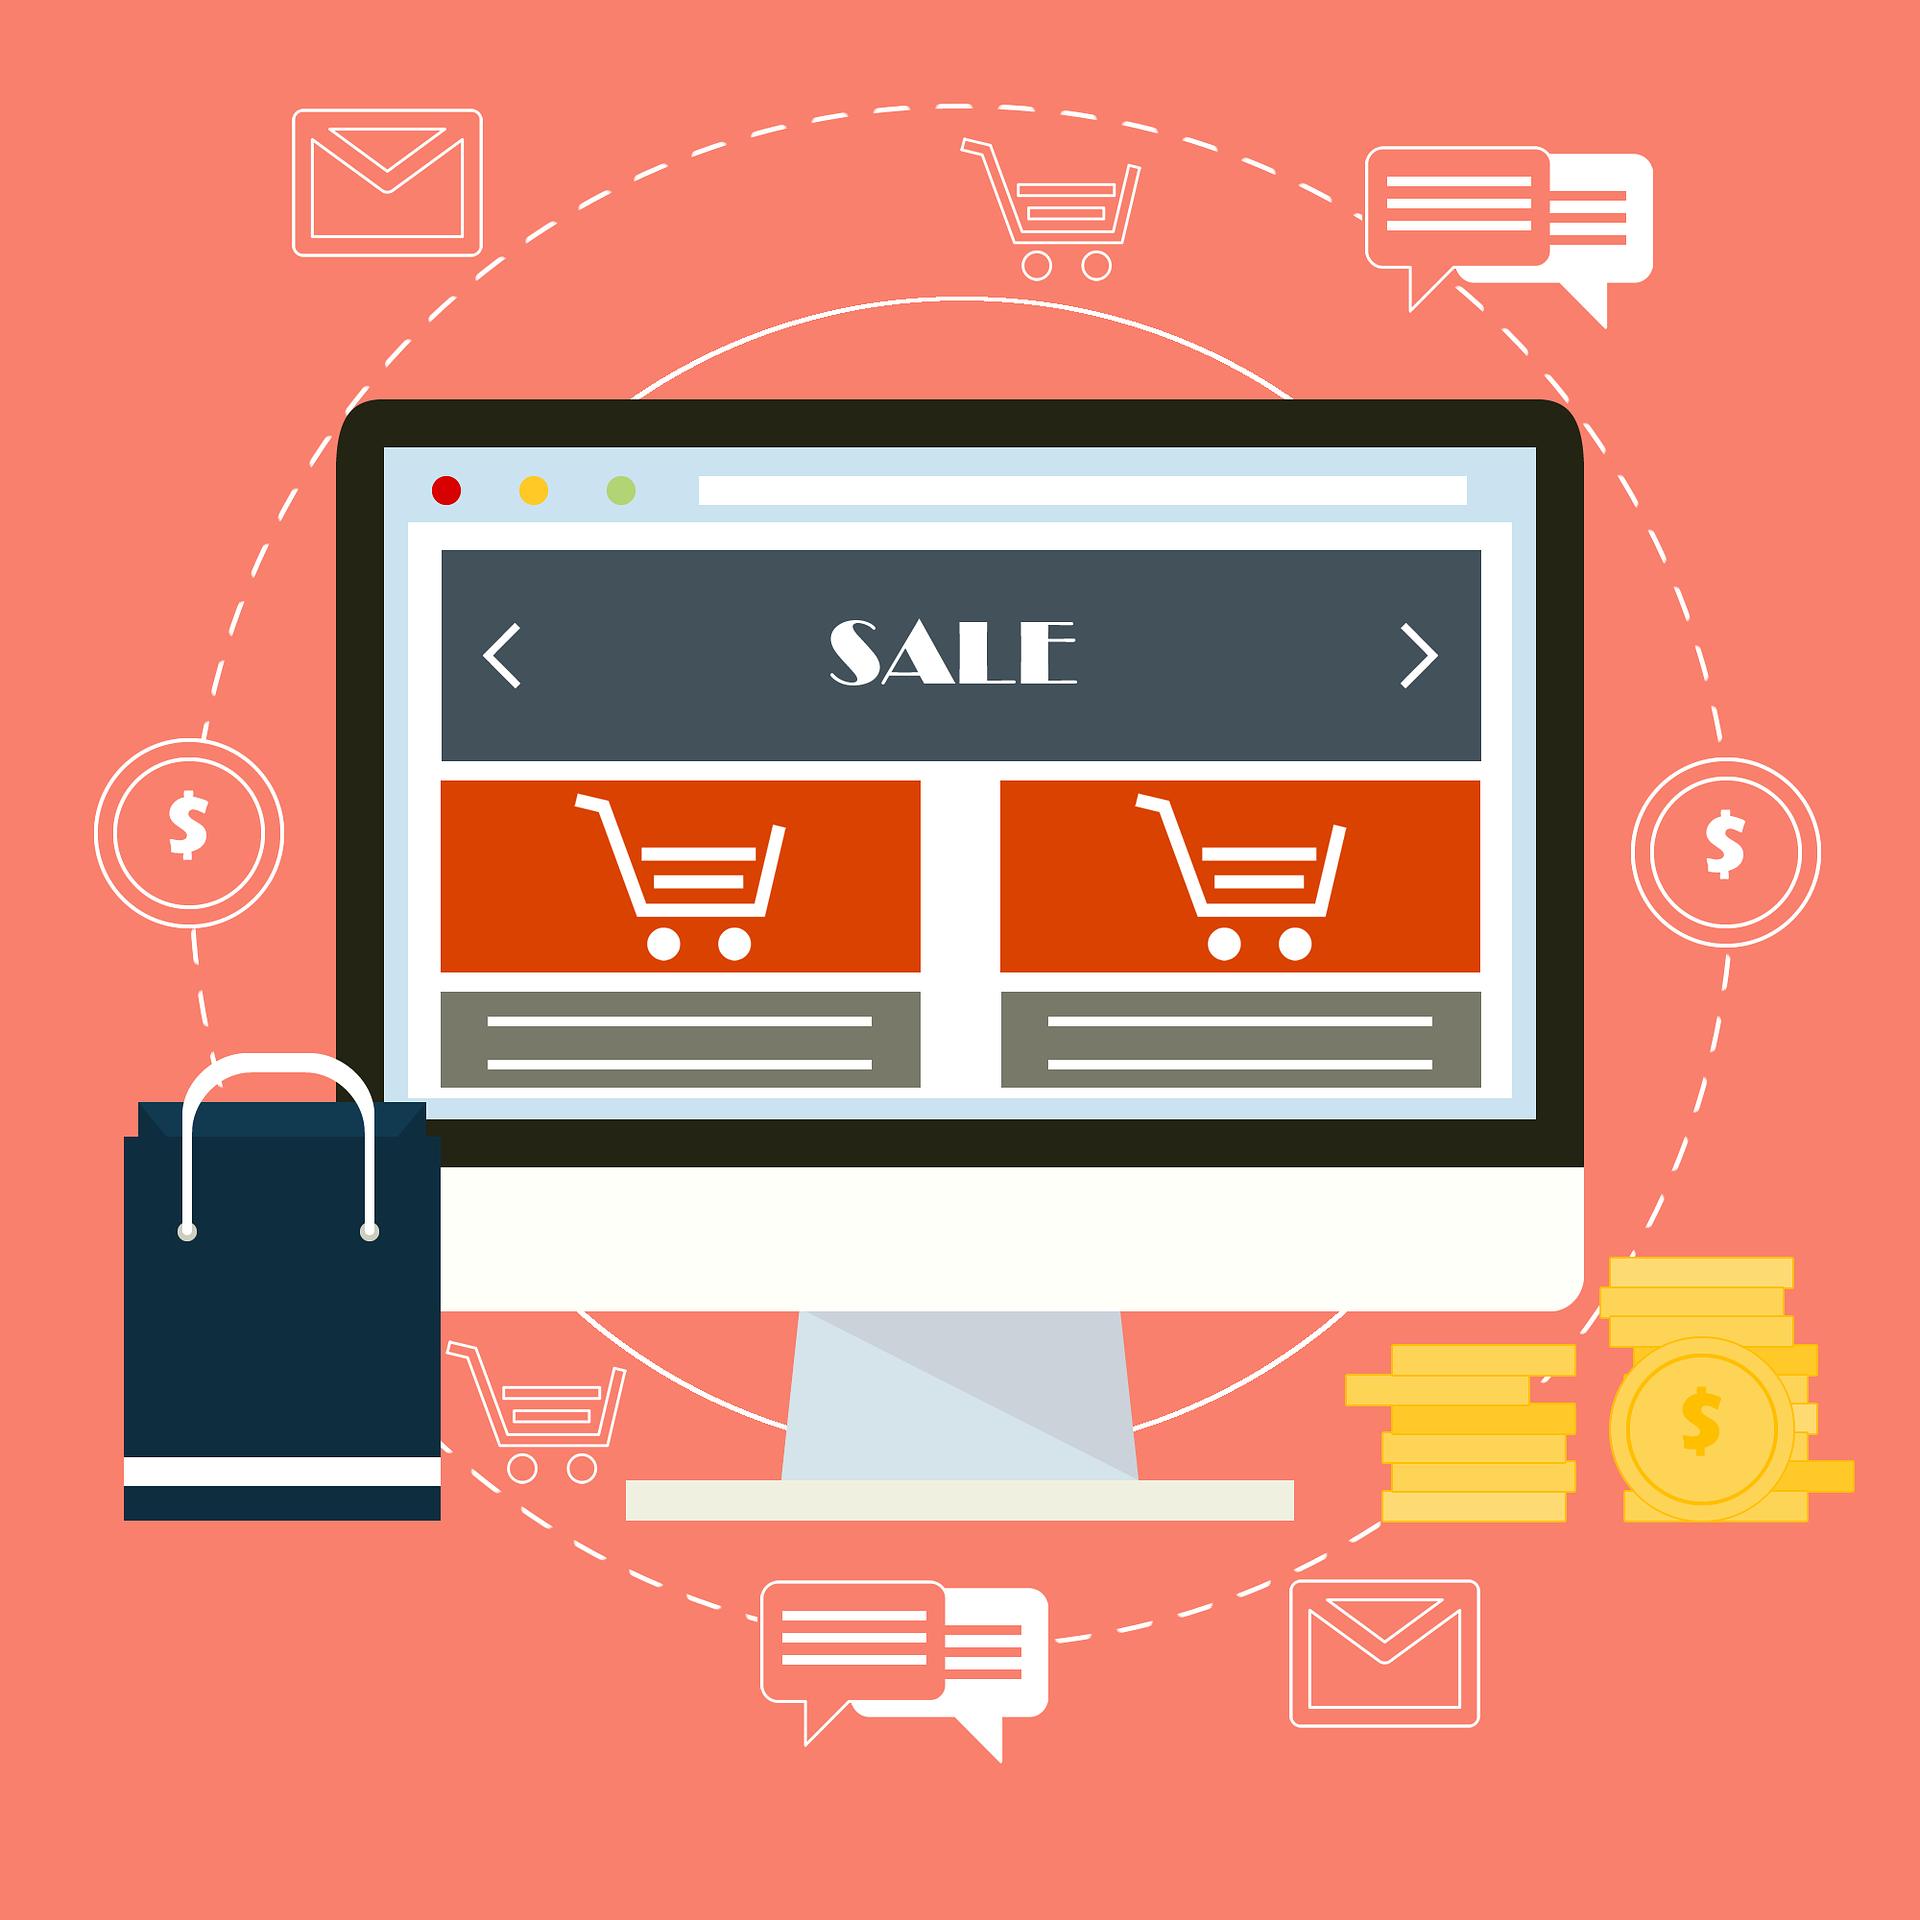 nodisorder shop online